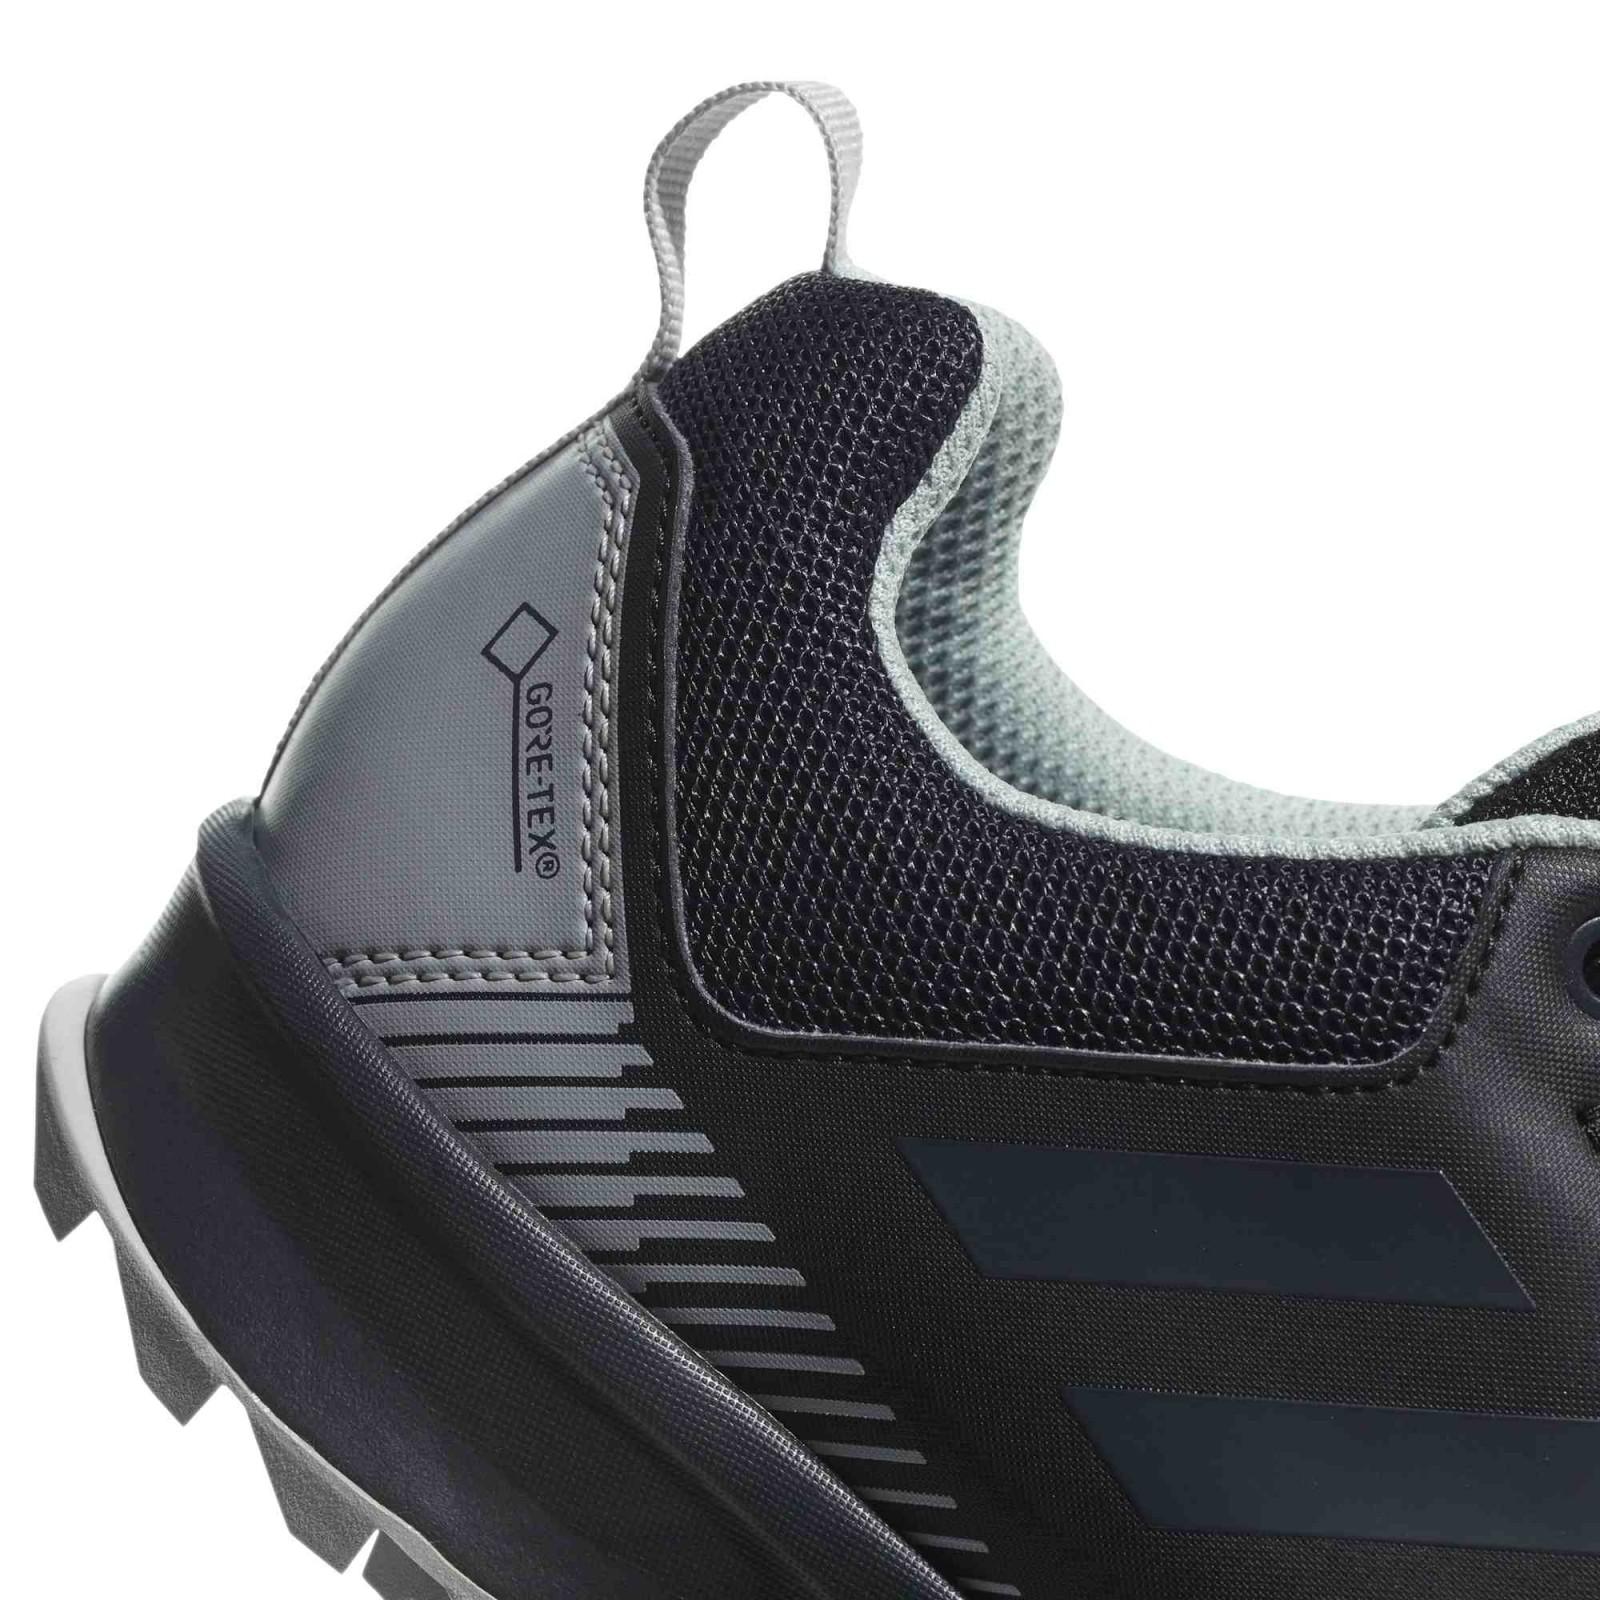 87fa2650a Dámská Treková obuv adidas Performance TERREX TRACEROCKER GTX W | D ...